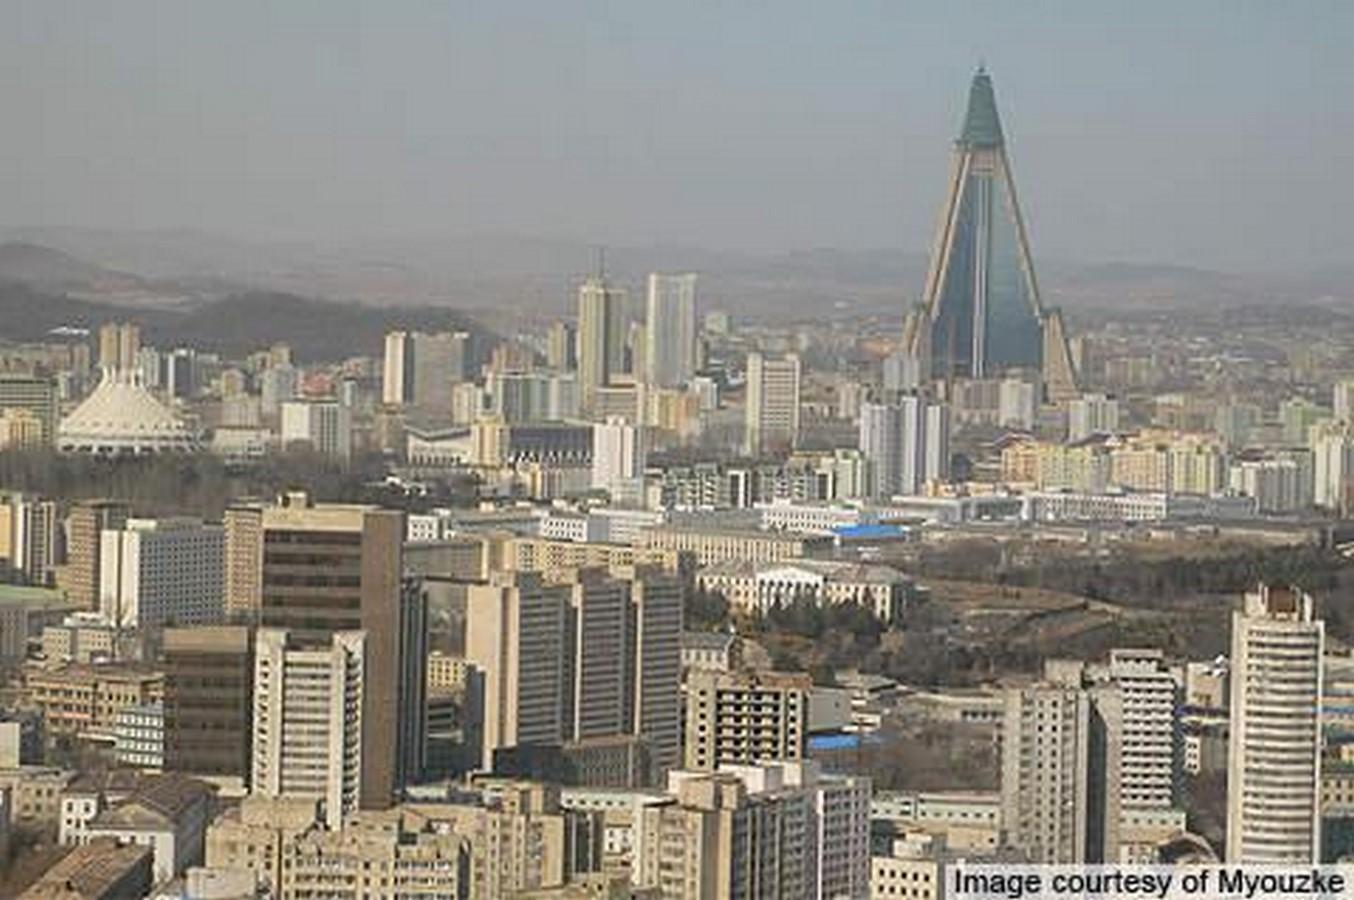 Ryugyong Hotel - North Korea - Sheet2